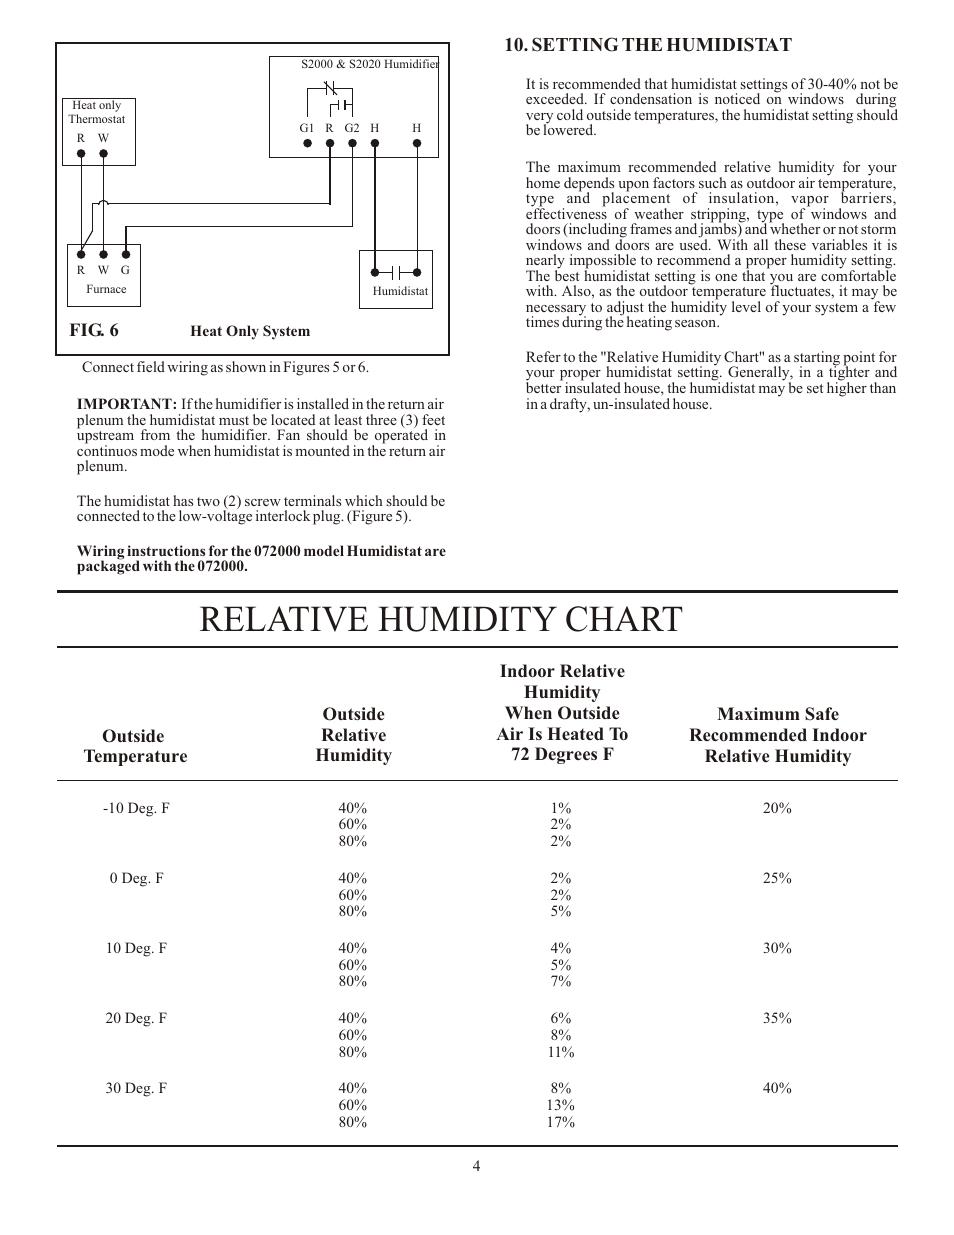 Relative Humidity Chart Setting The Humidistat Autoflo S2020 User Manual Page 4 12